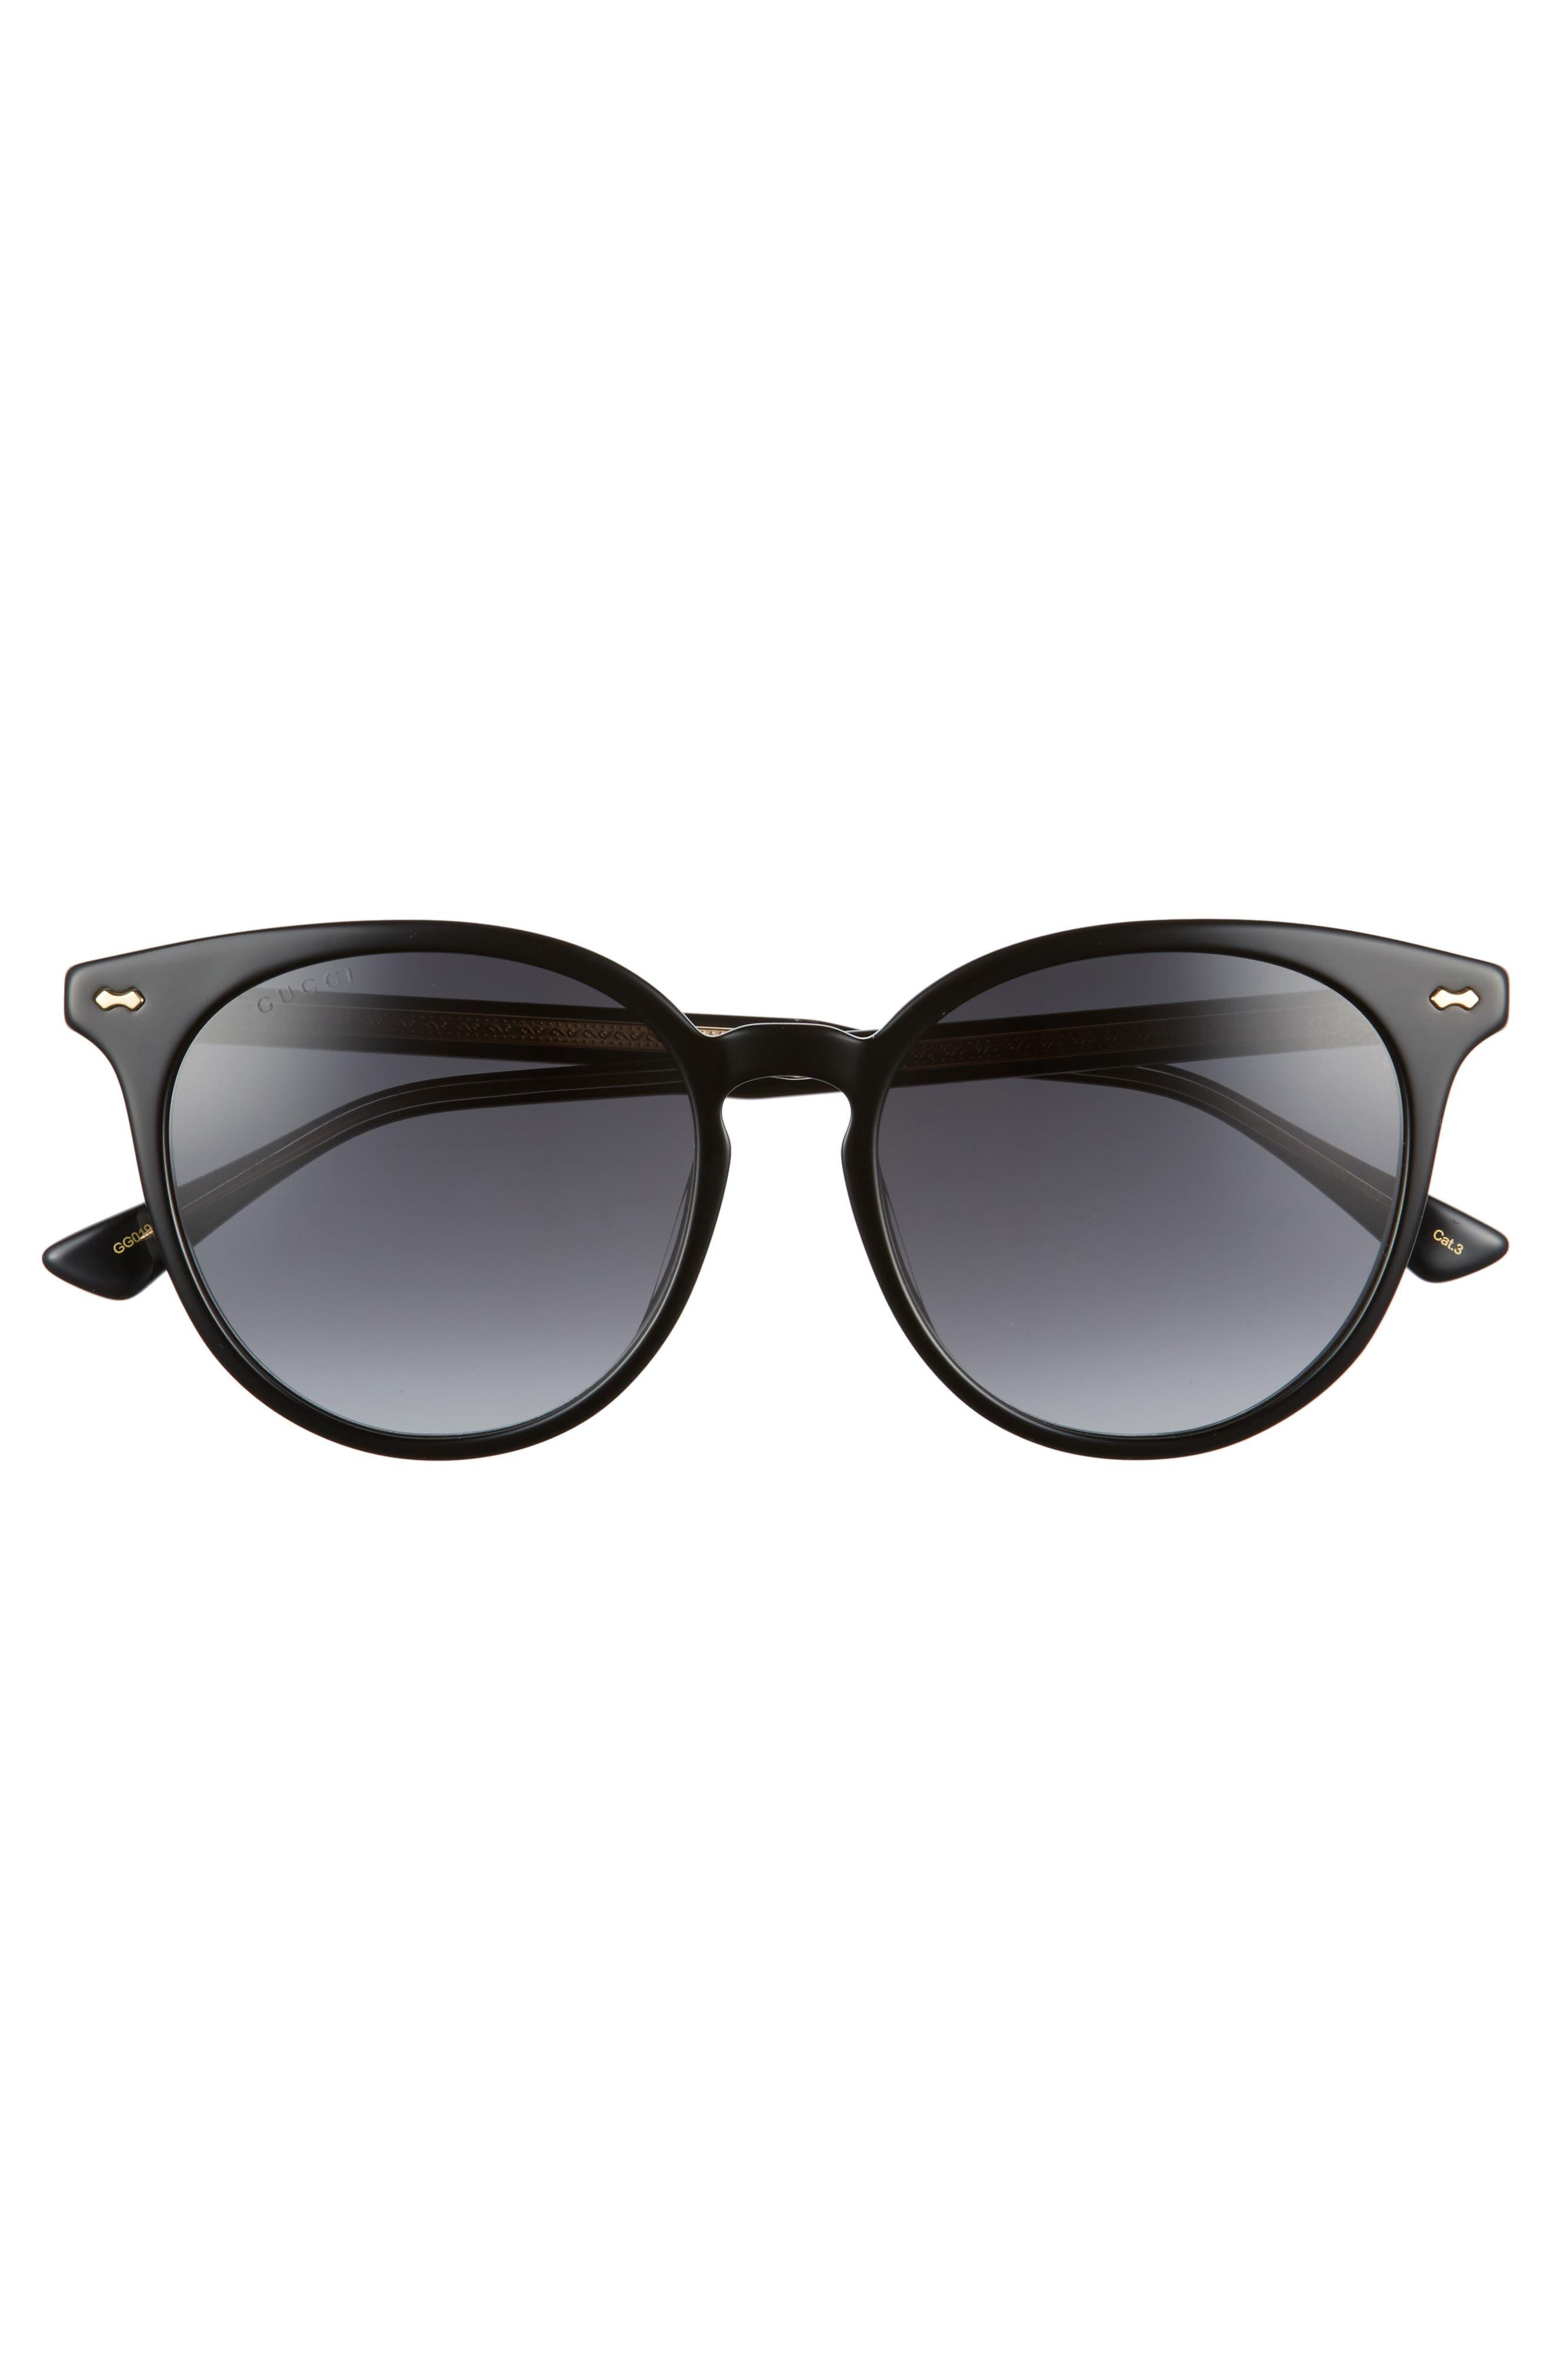 55mm Round Cat Eye Sunglasses,                             Alternate thumbnail 3, color,                             Black